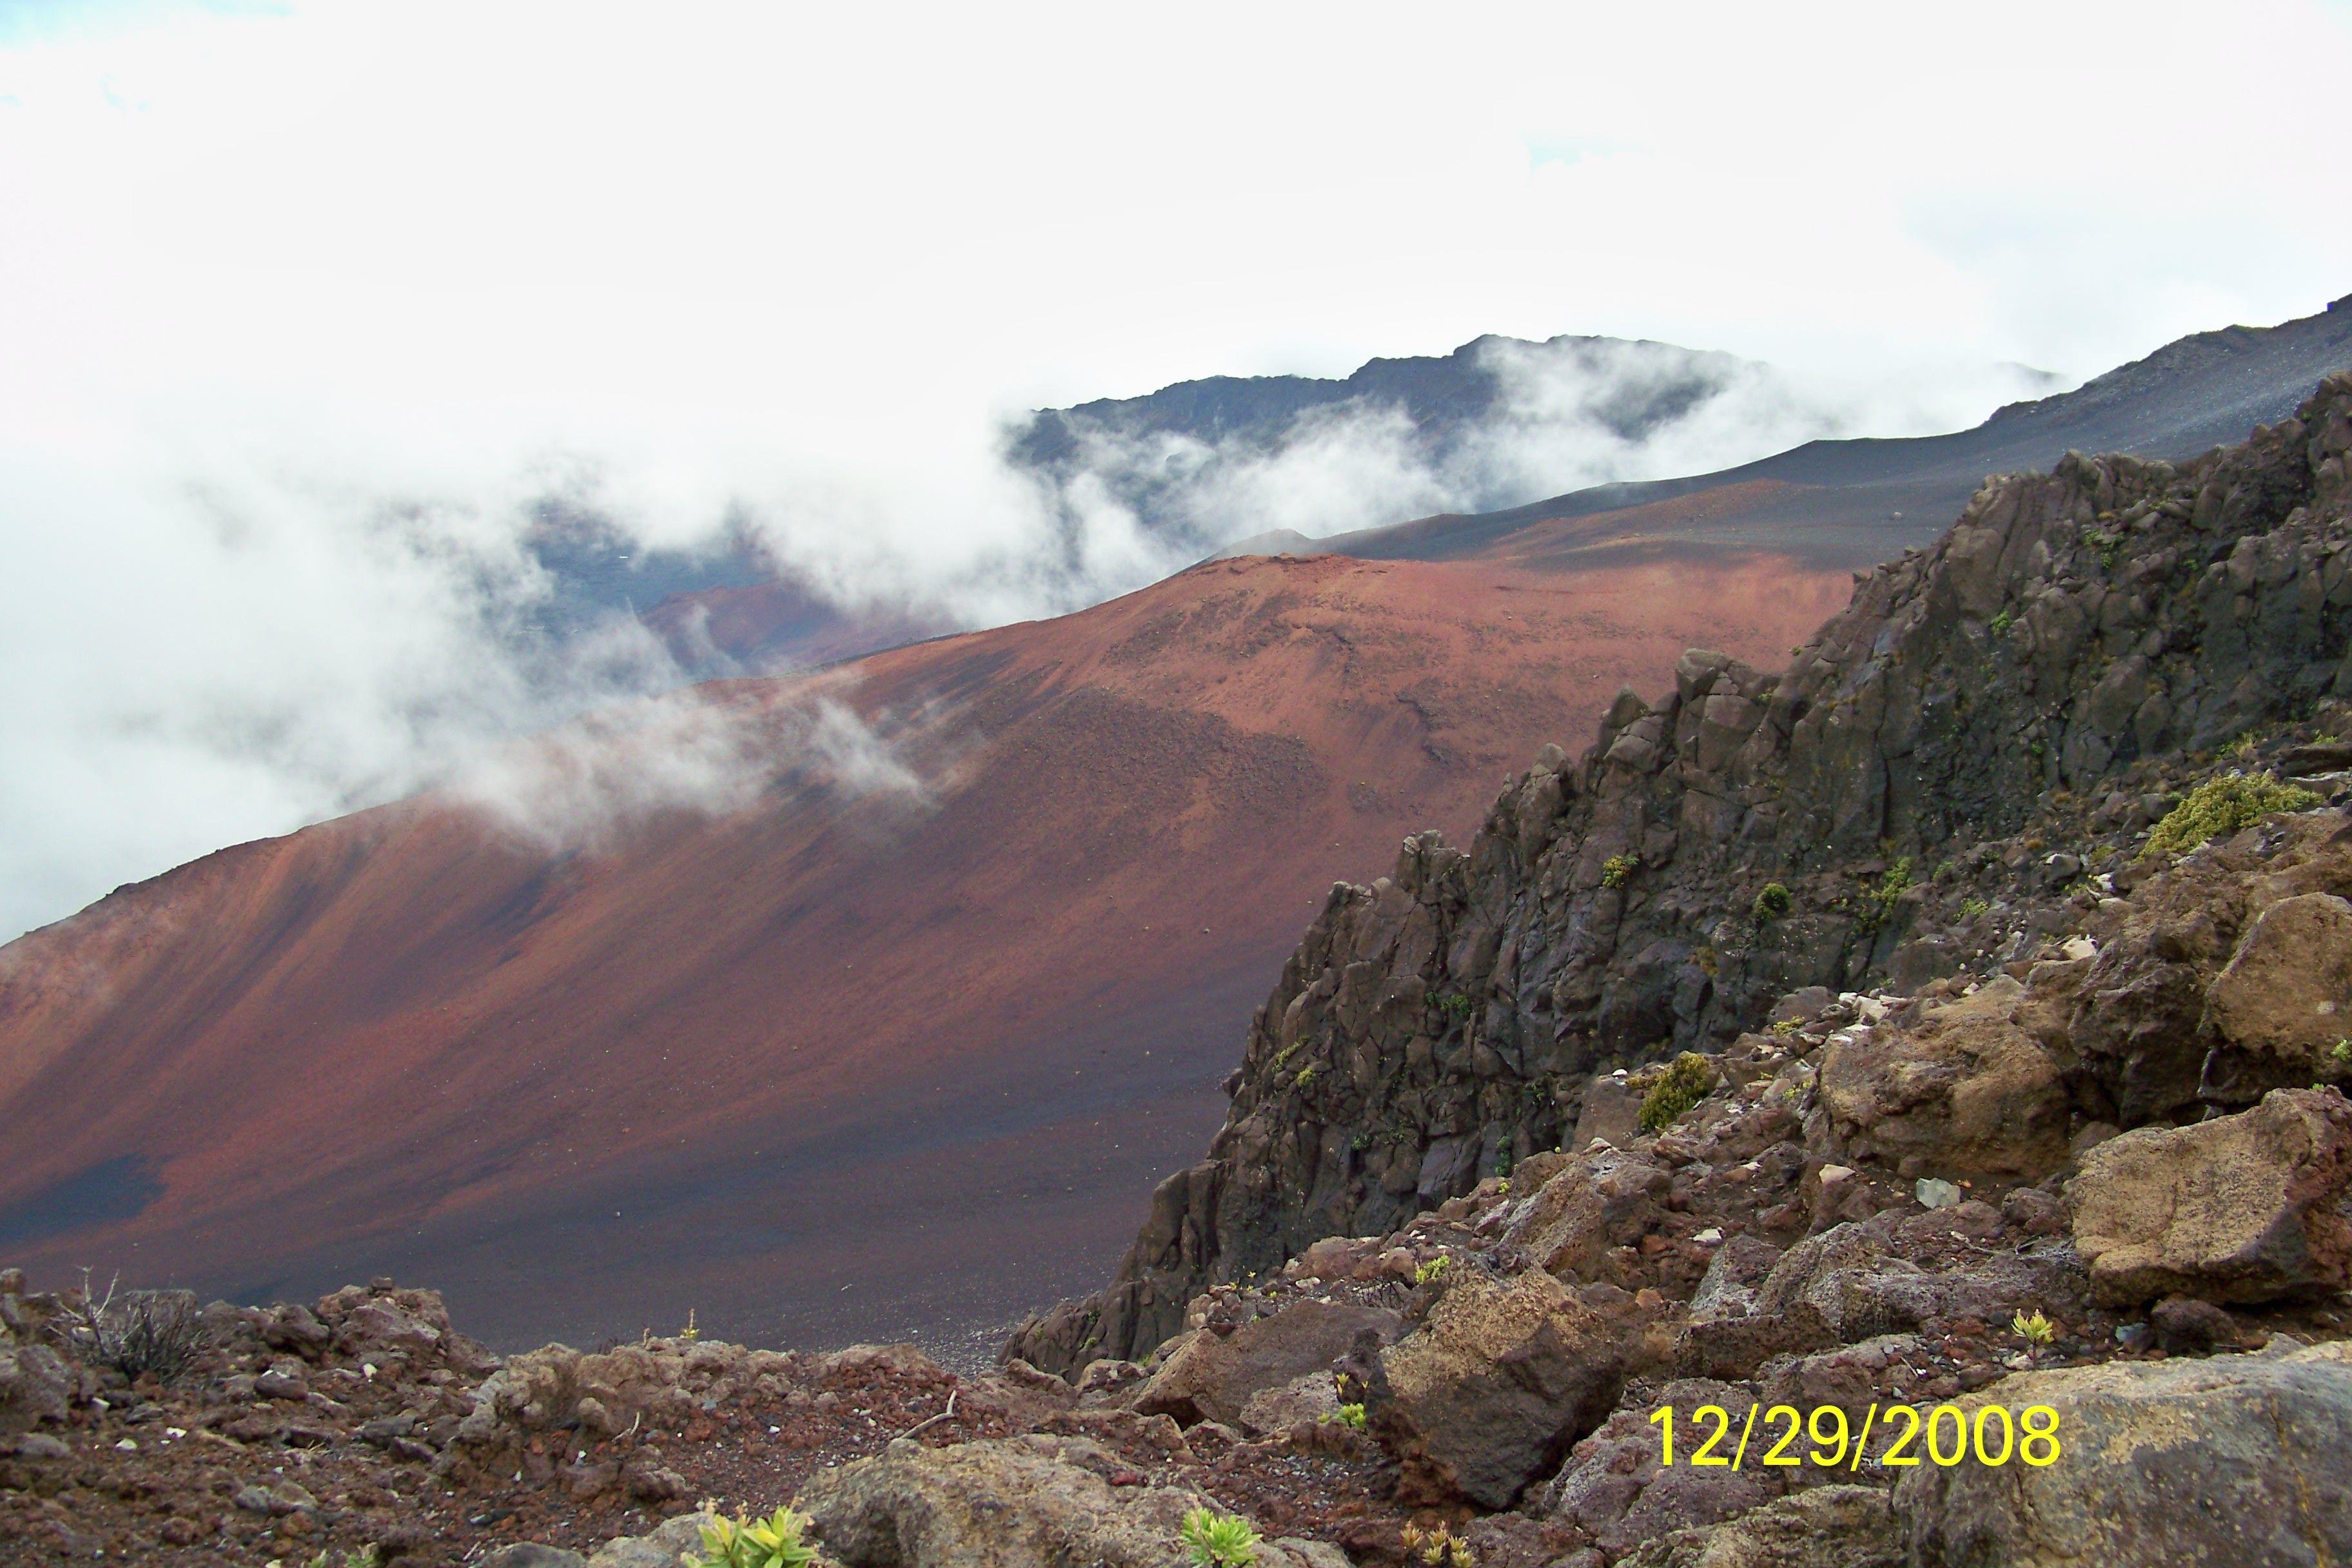 Maui-Haleakala Crater. rode a bike all the way down!